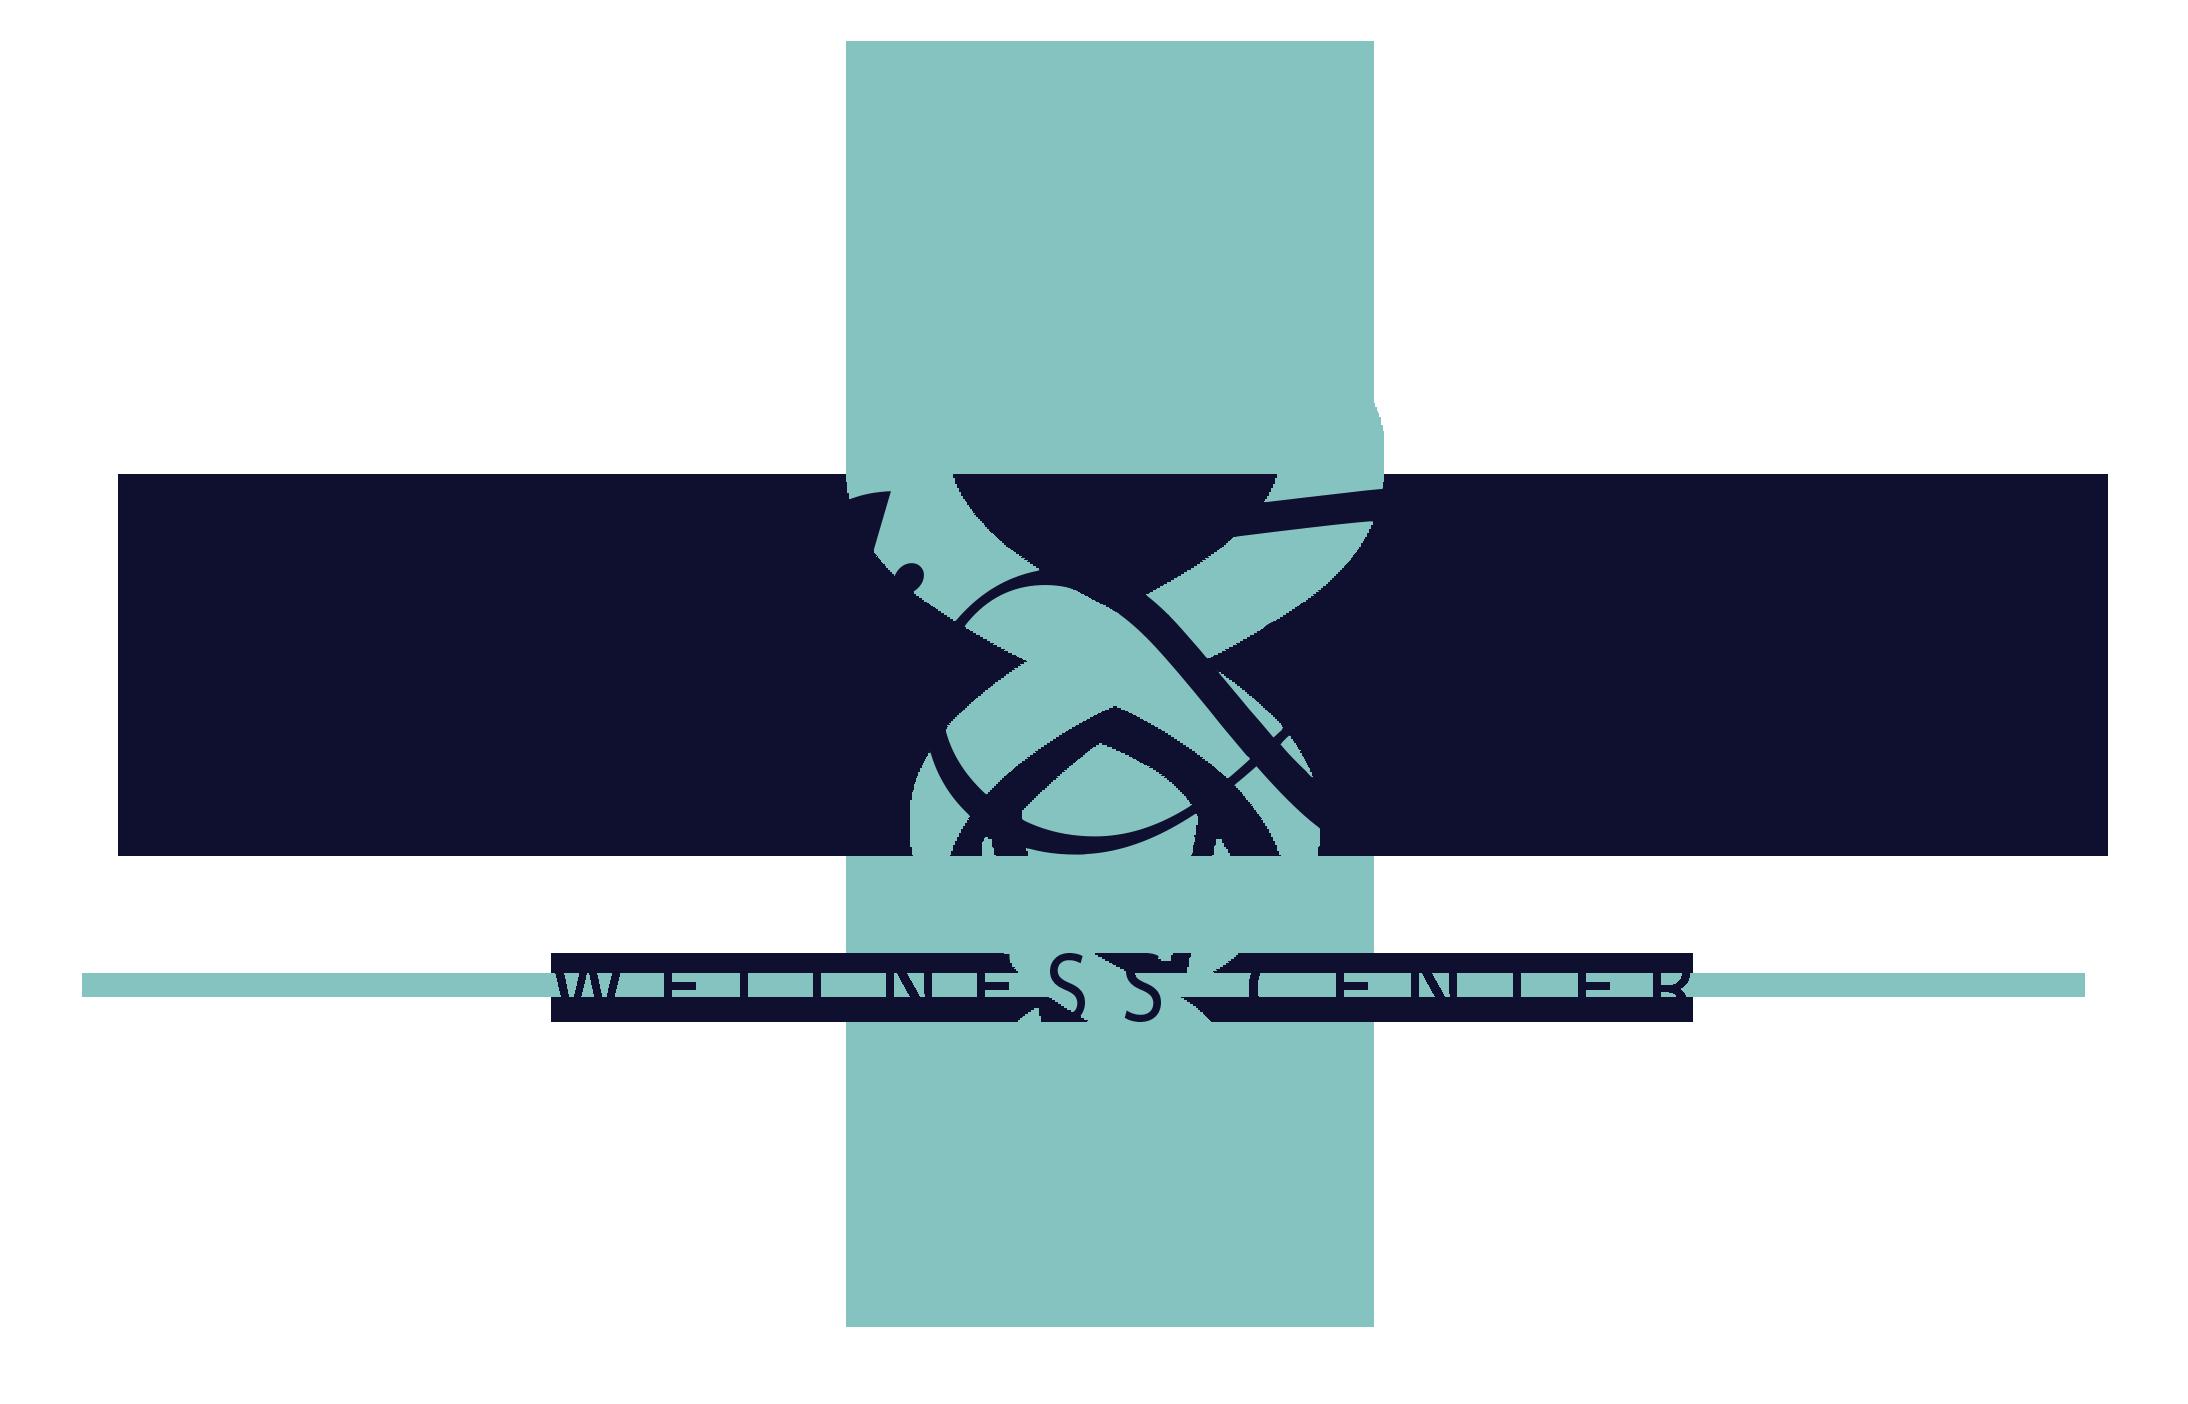 MBW_logo300dpi.png